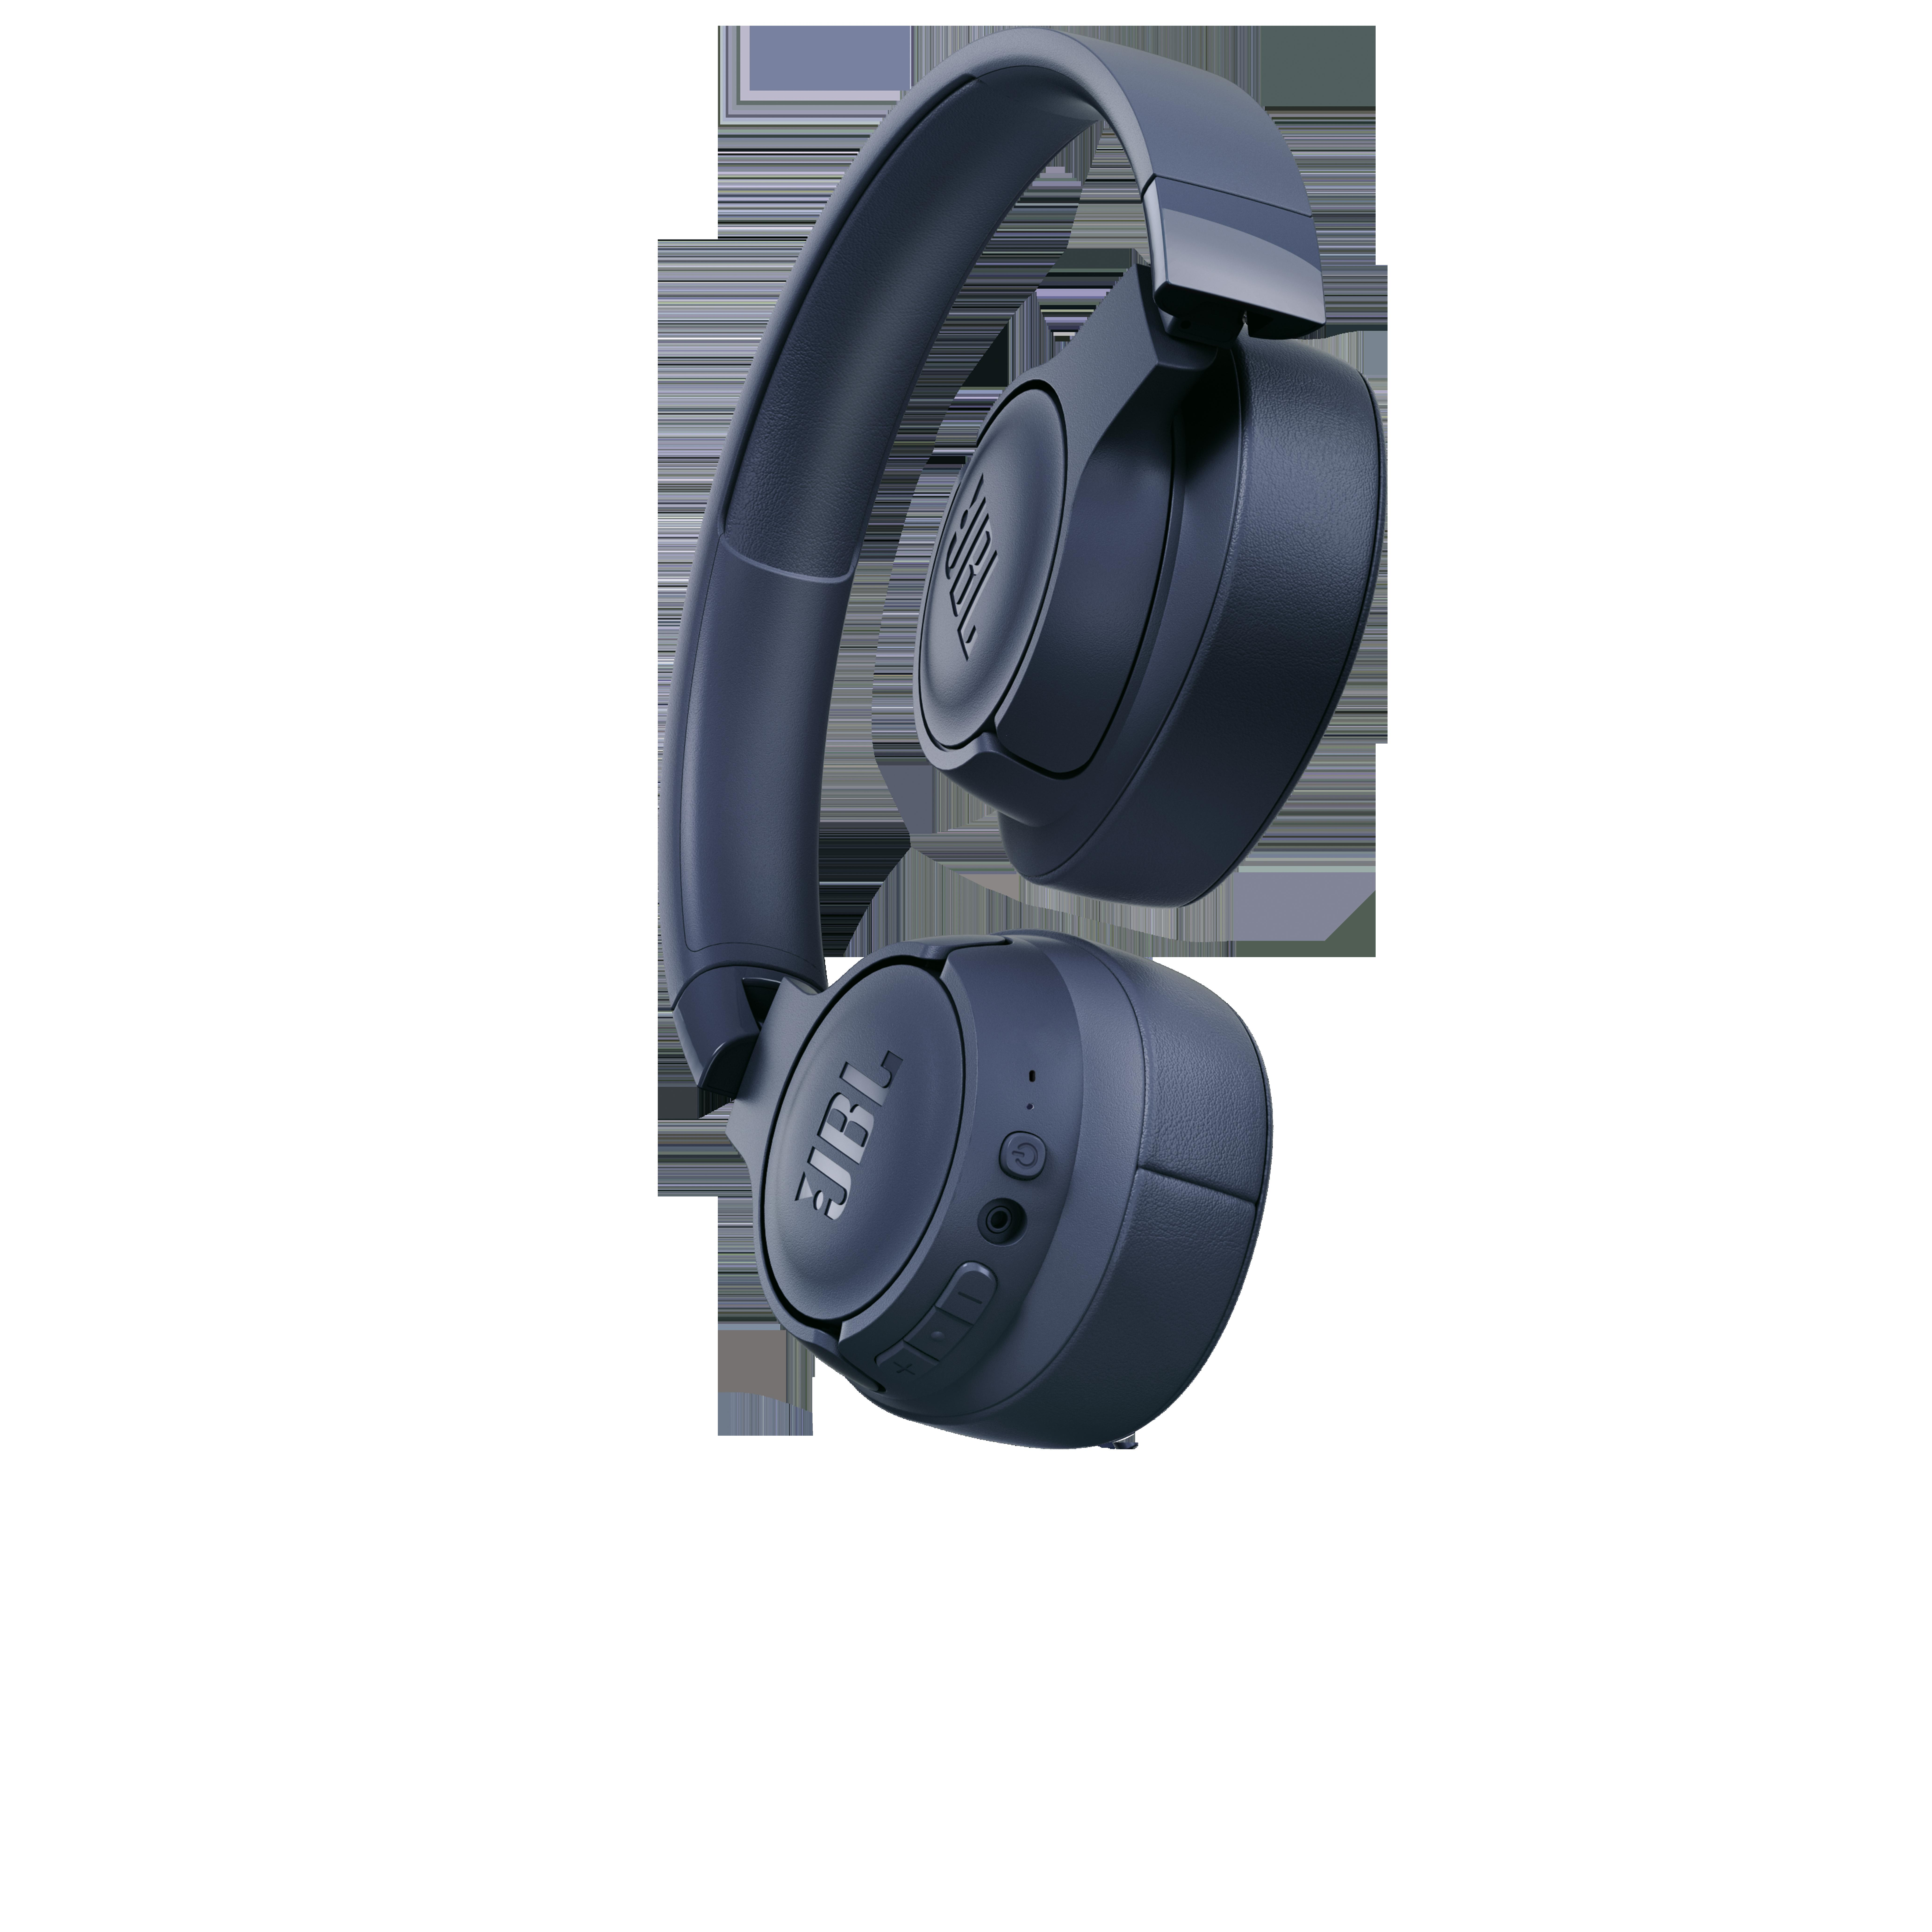 JBL TUNE 700BT - Blue - Wireless Over-Ear Headphones - Detailshot 1